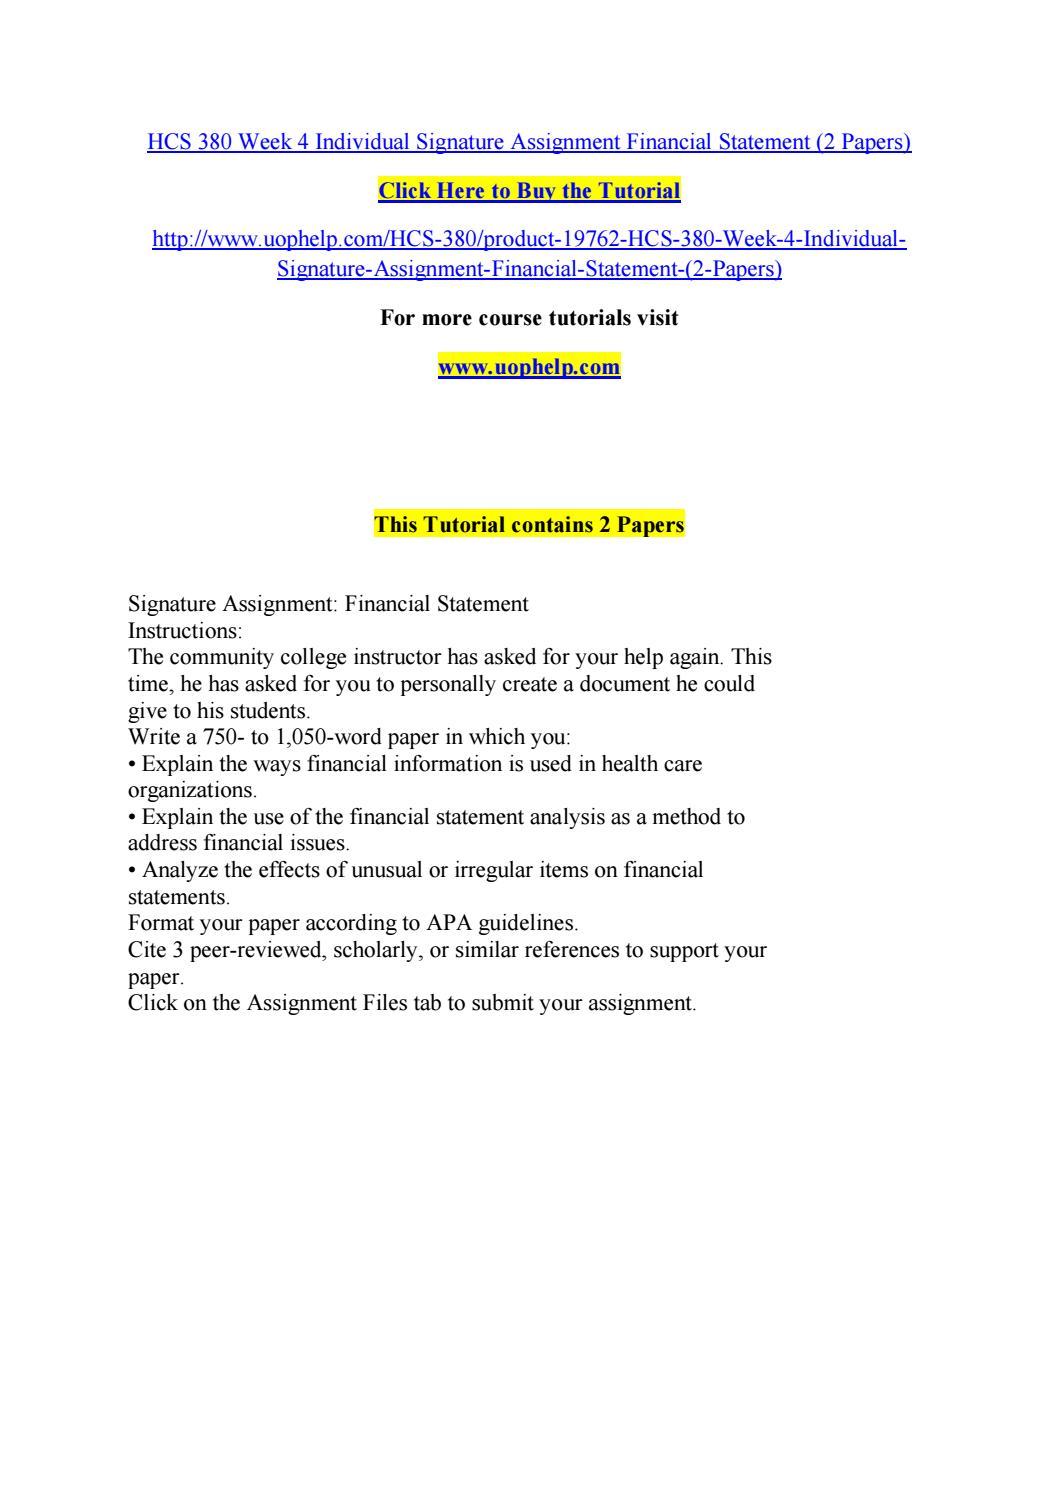 hcs 380 week 4 individual signature assignment financial